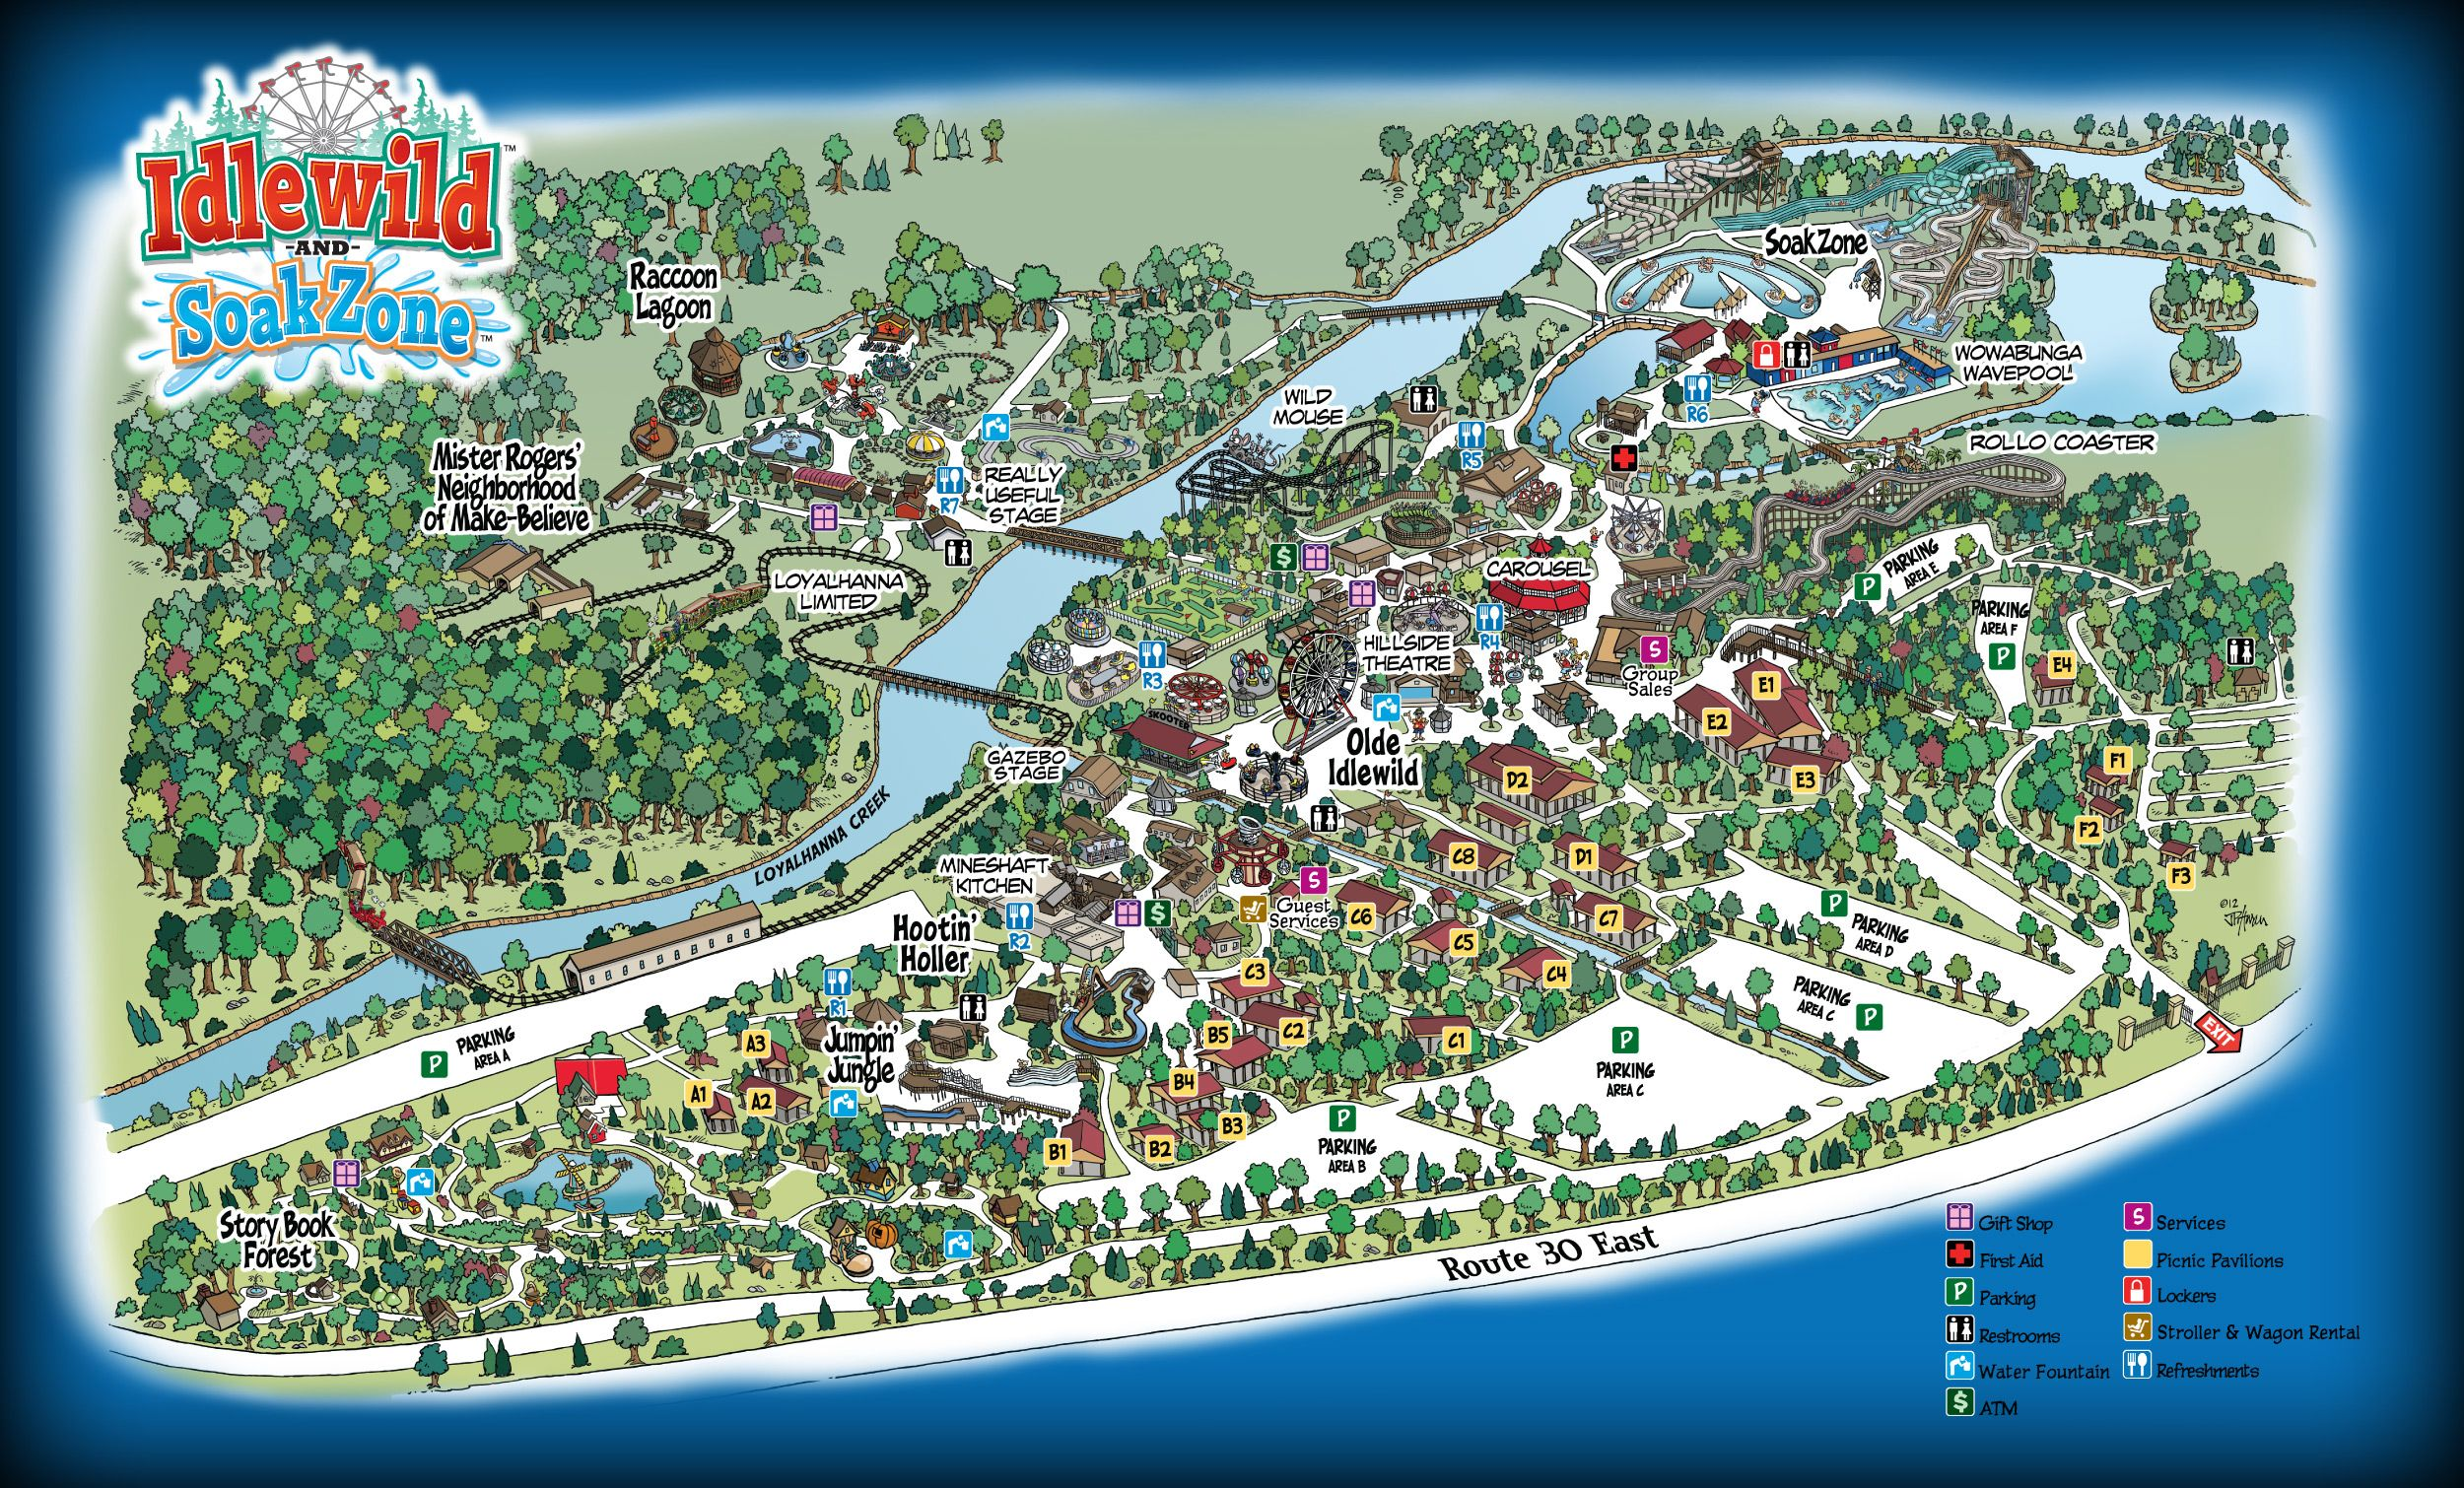 Park Map Idlewild and SoakZone Park